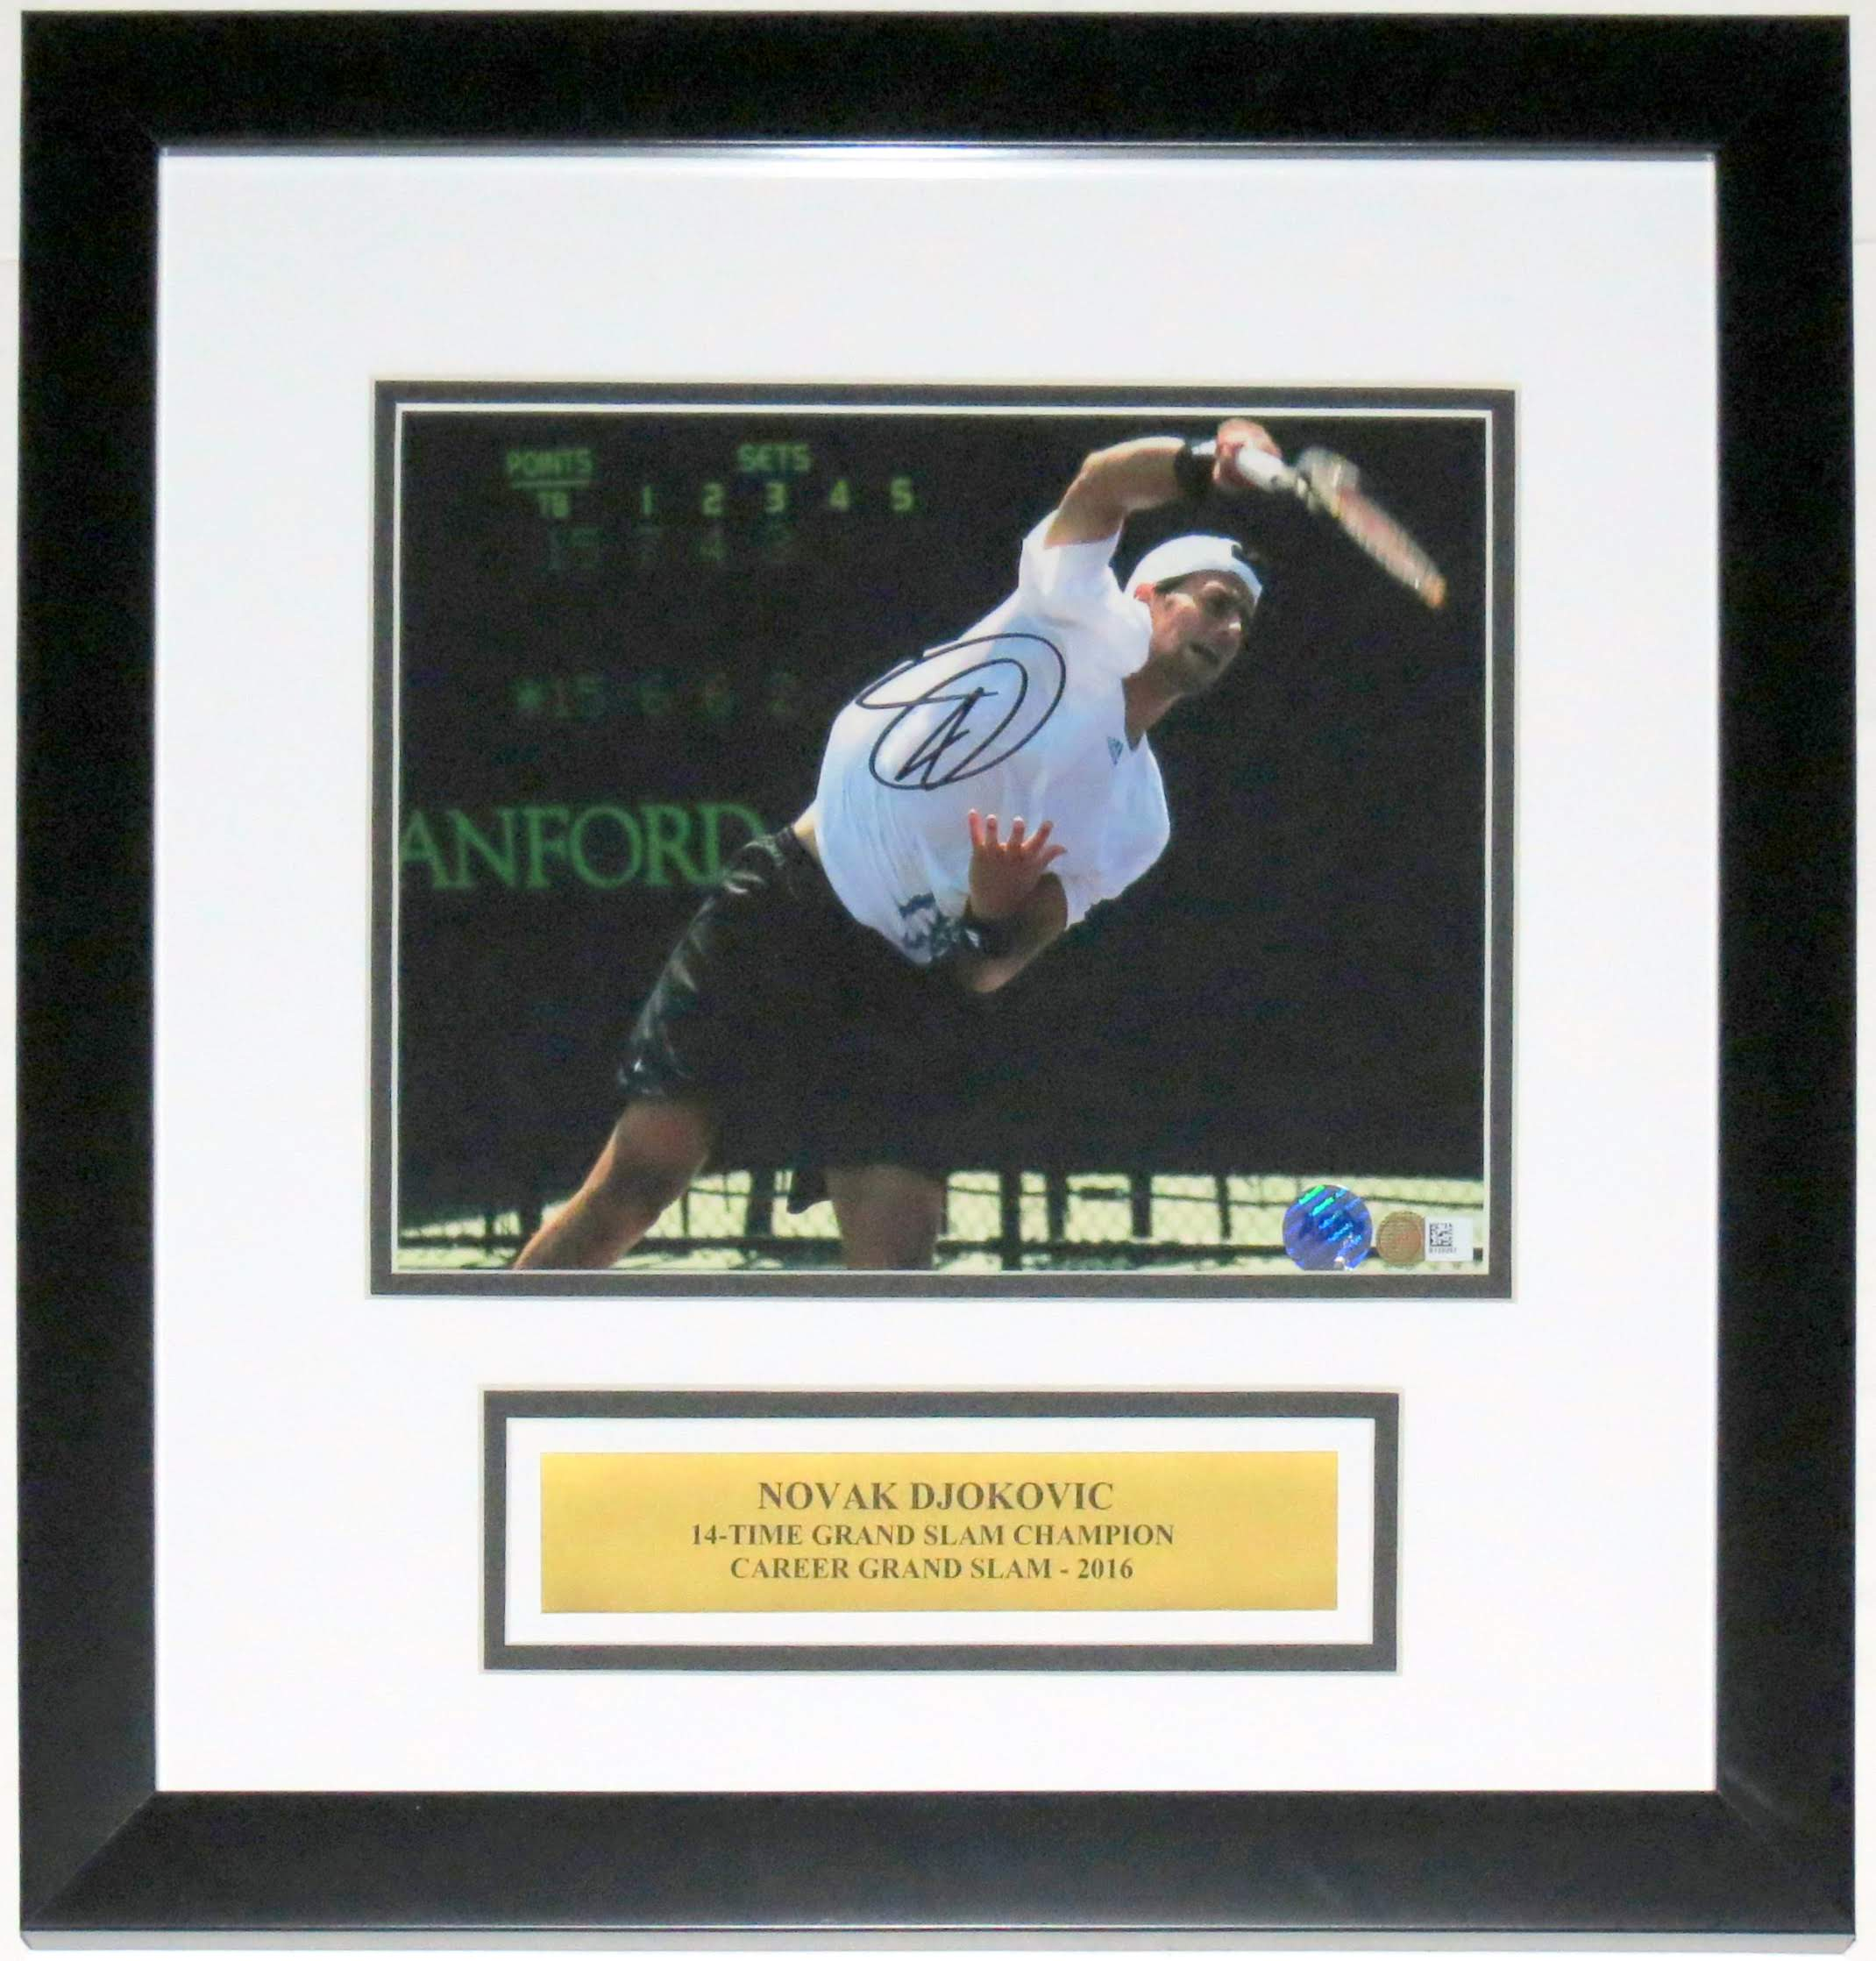 Novak Djokovic Signed 8x10 Photo - BSI COA Authenticated - Professionally Framed & Plate